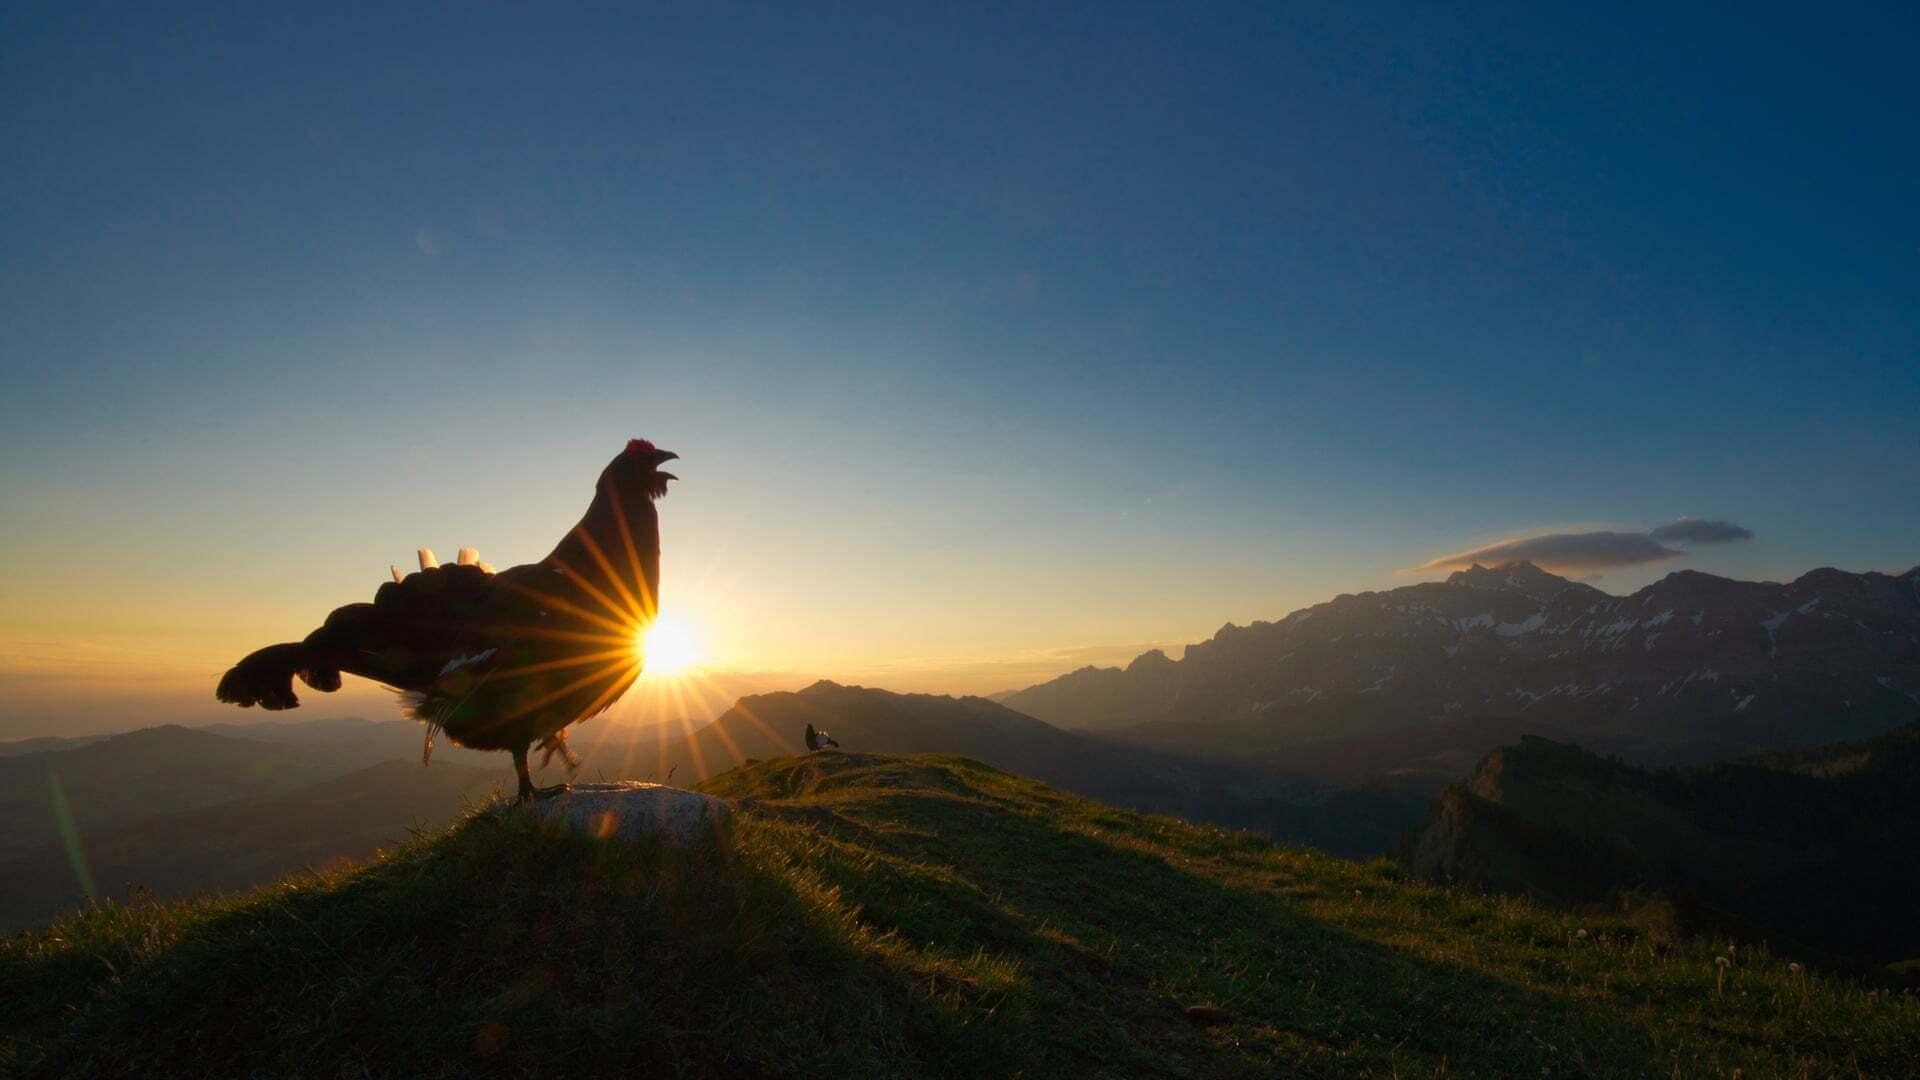 צילום: Levi Fitze /2021 bird photographer of the year